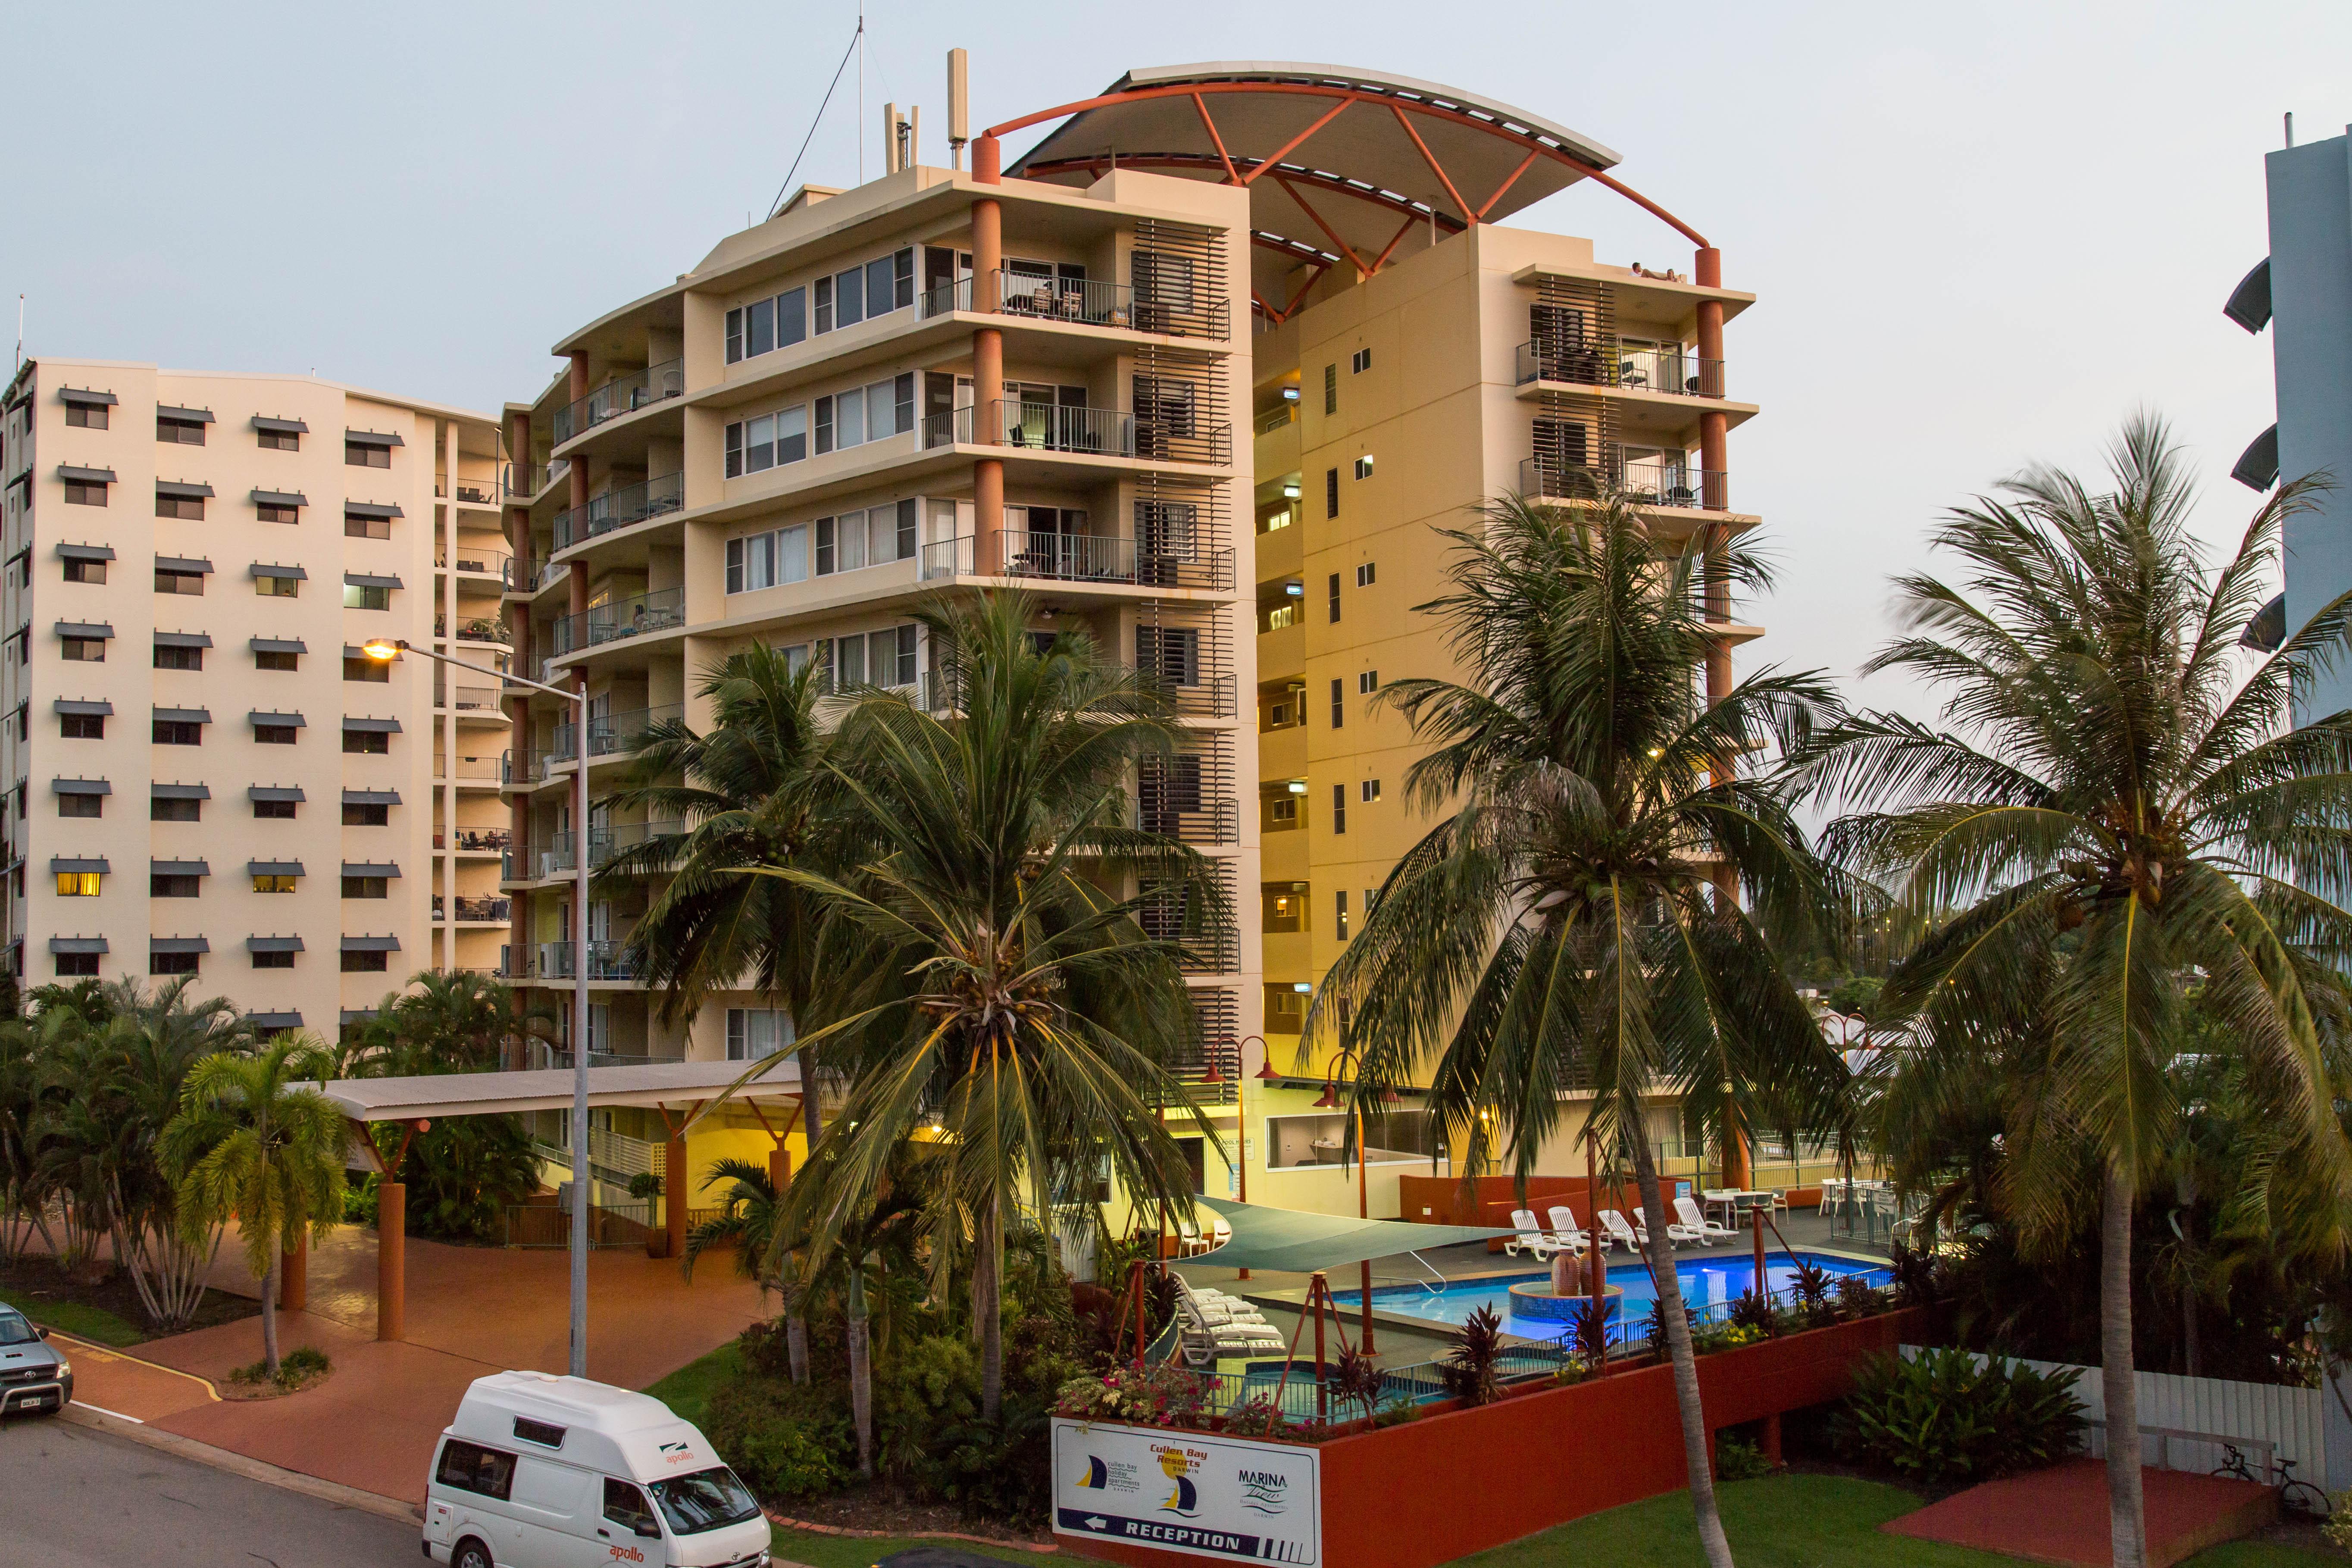 Cullen Bay Resorts By Vivo, Larrakeyah